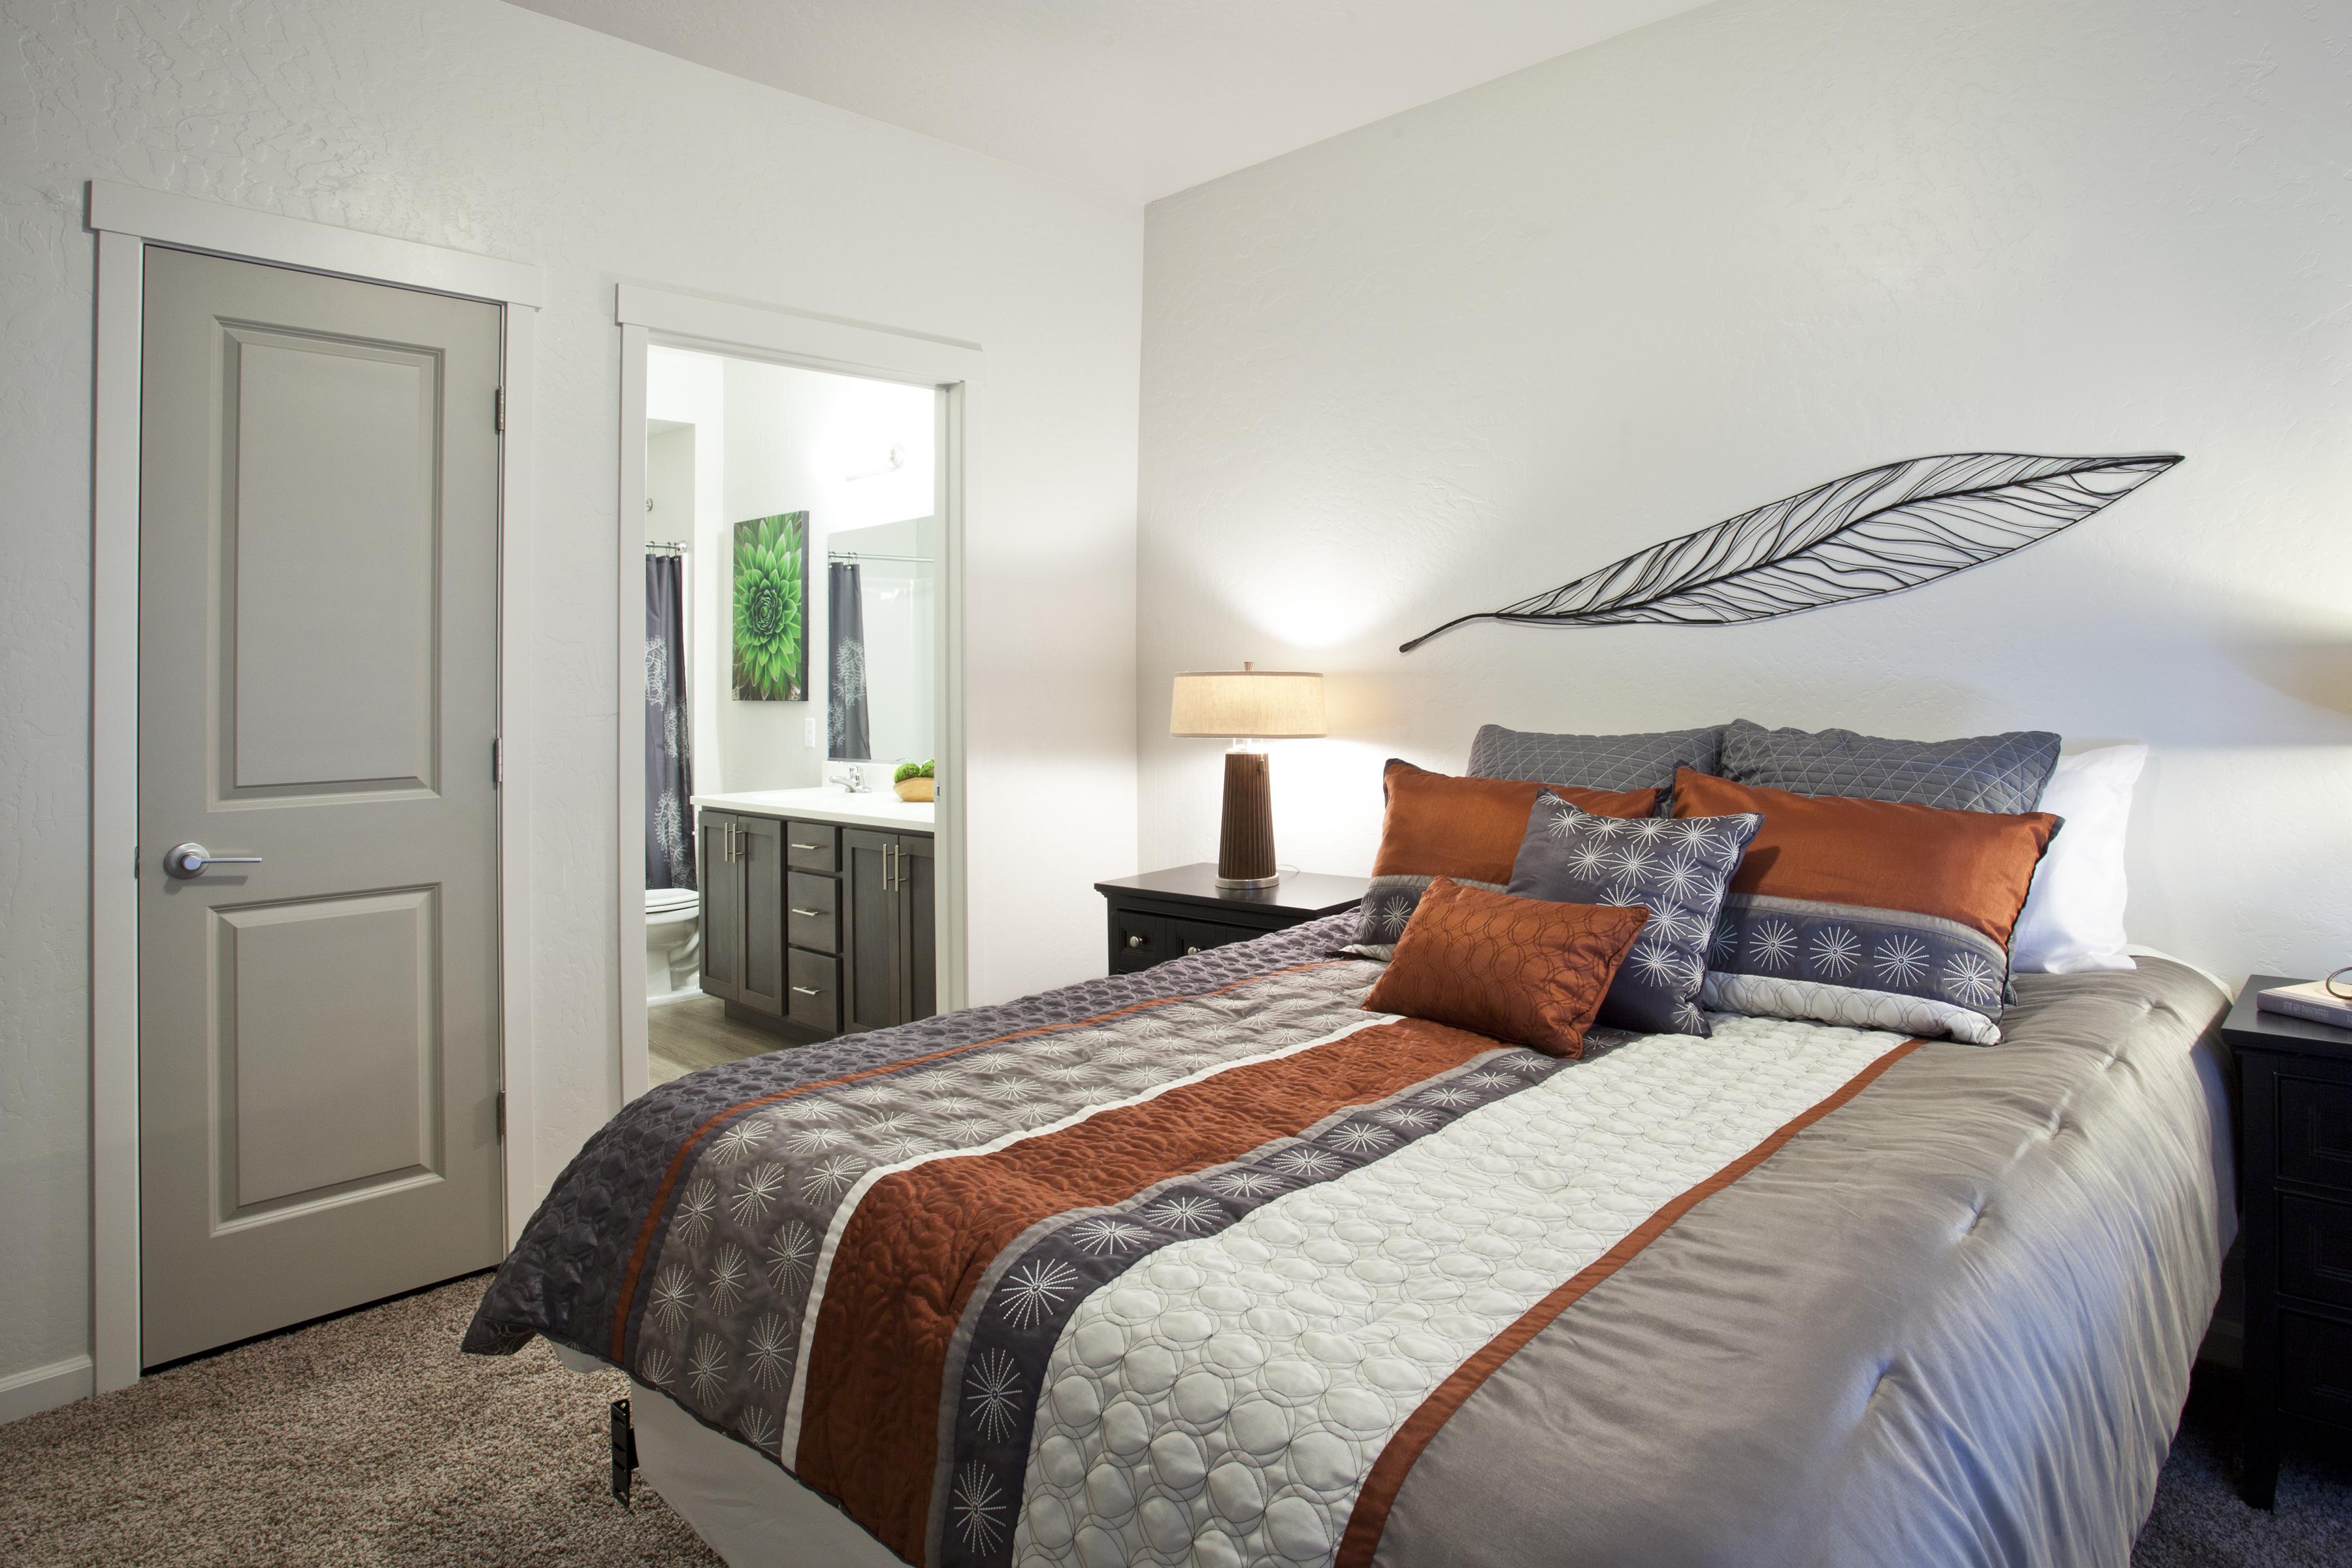 Gallery Legacy Villas Apartments In Liberty Lake Wa 99019